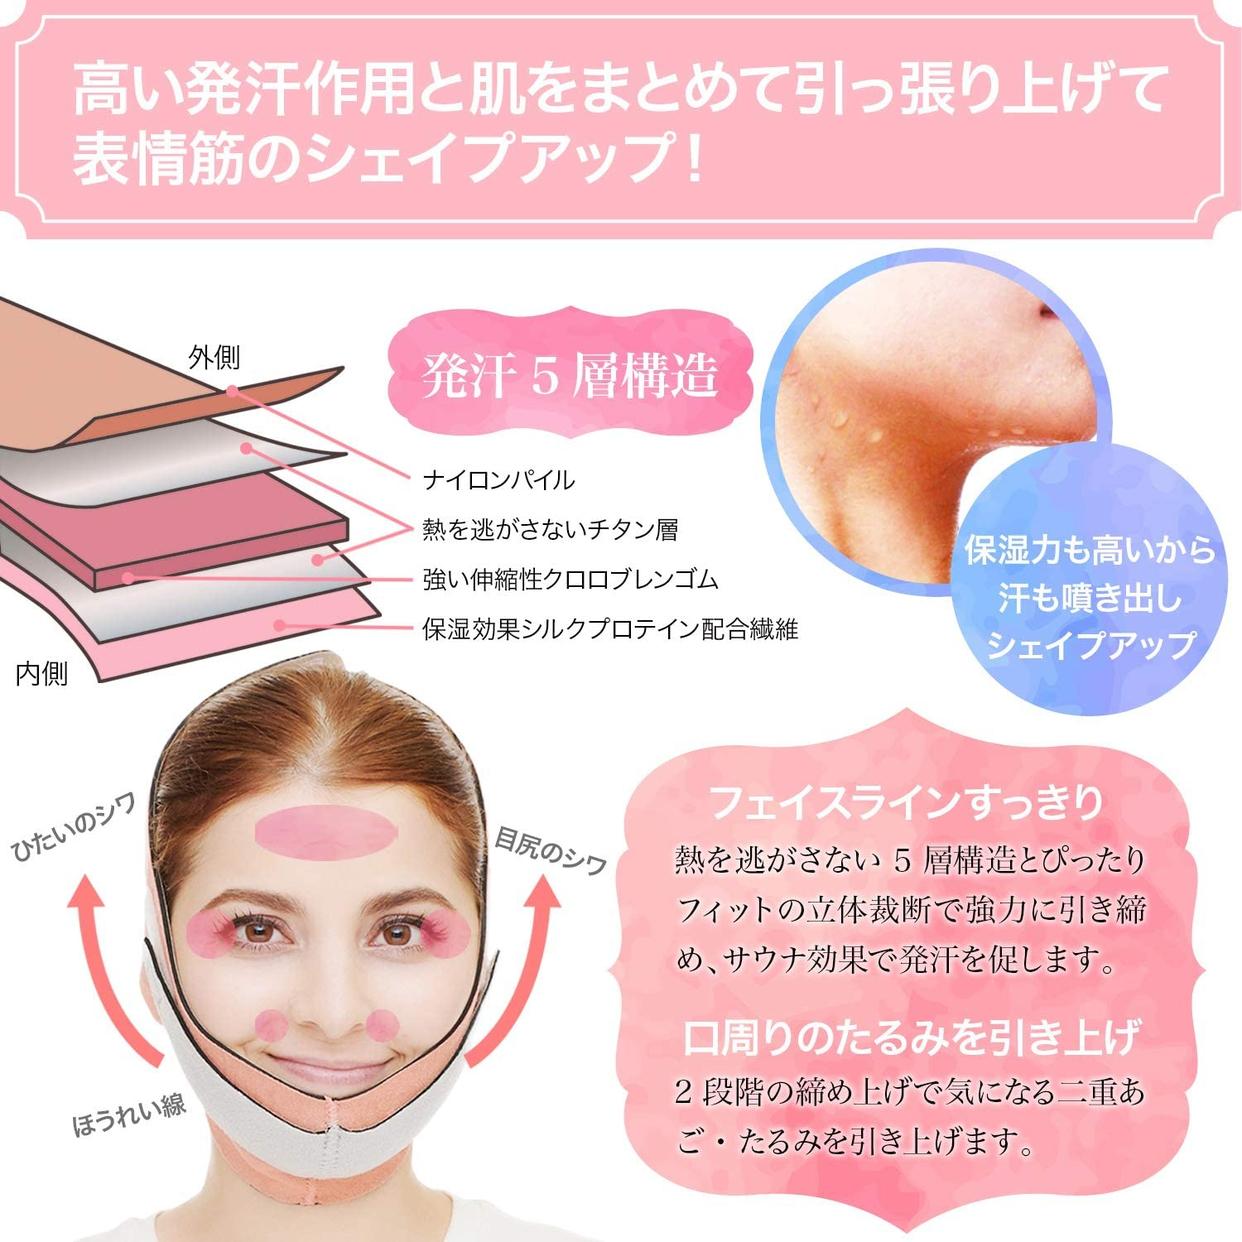 PLEASINGSAN(プリージングサン) 【改良版】 小顔 矯正ベルトの商品画像6